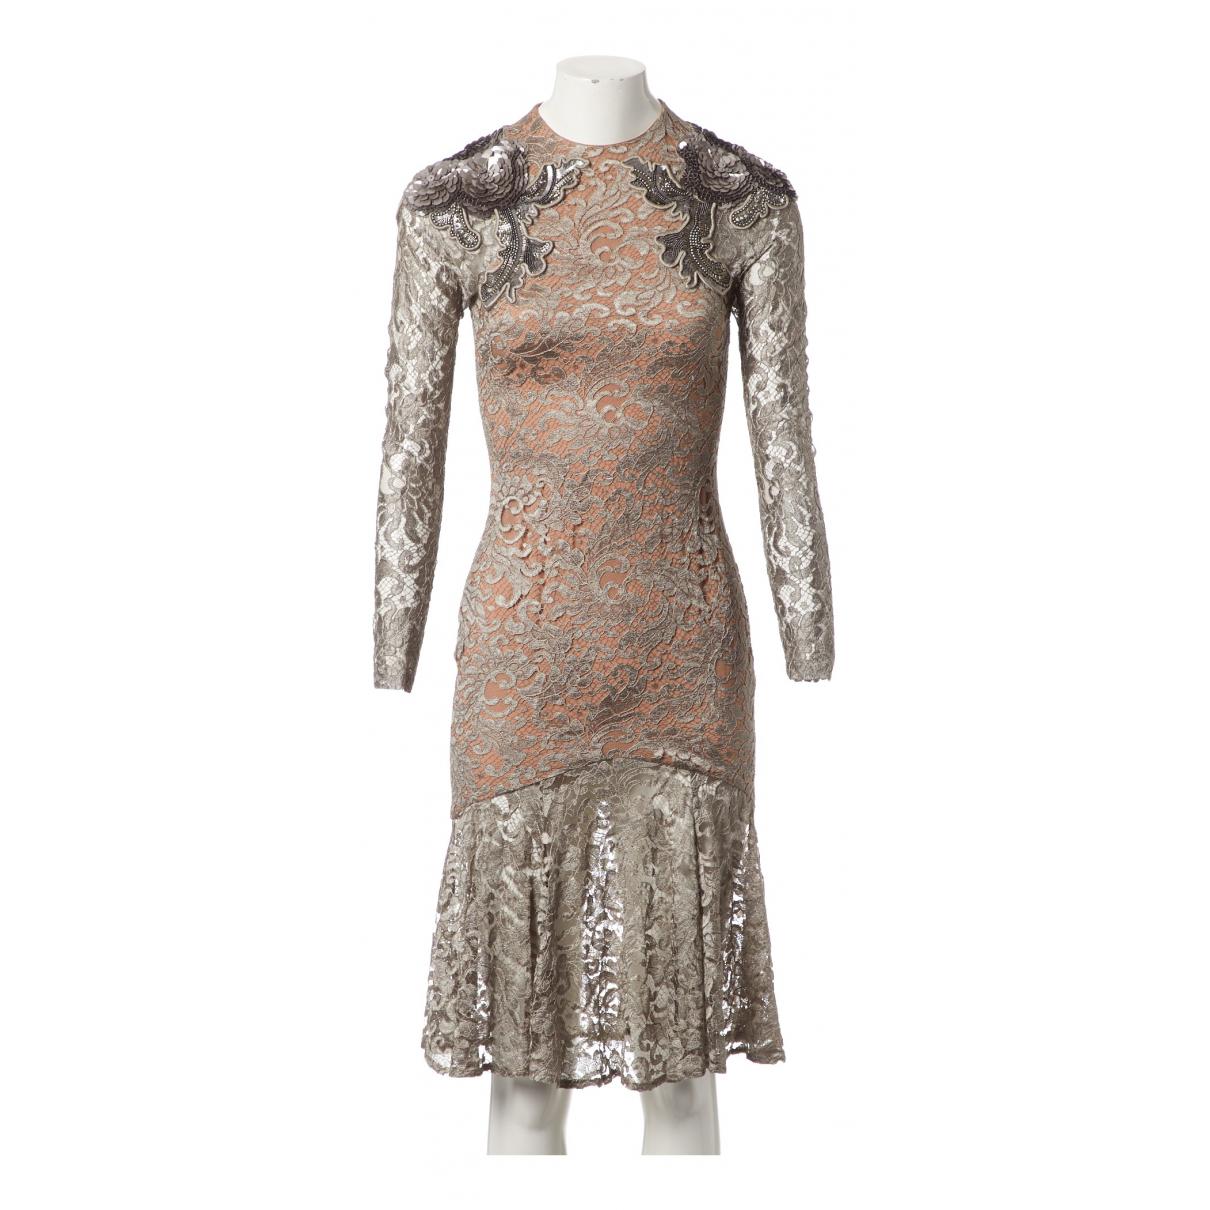 Matthew Williamson \N Gold dress for Women 8 UK